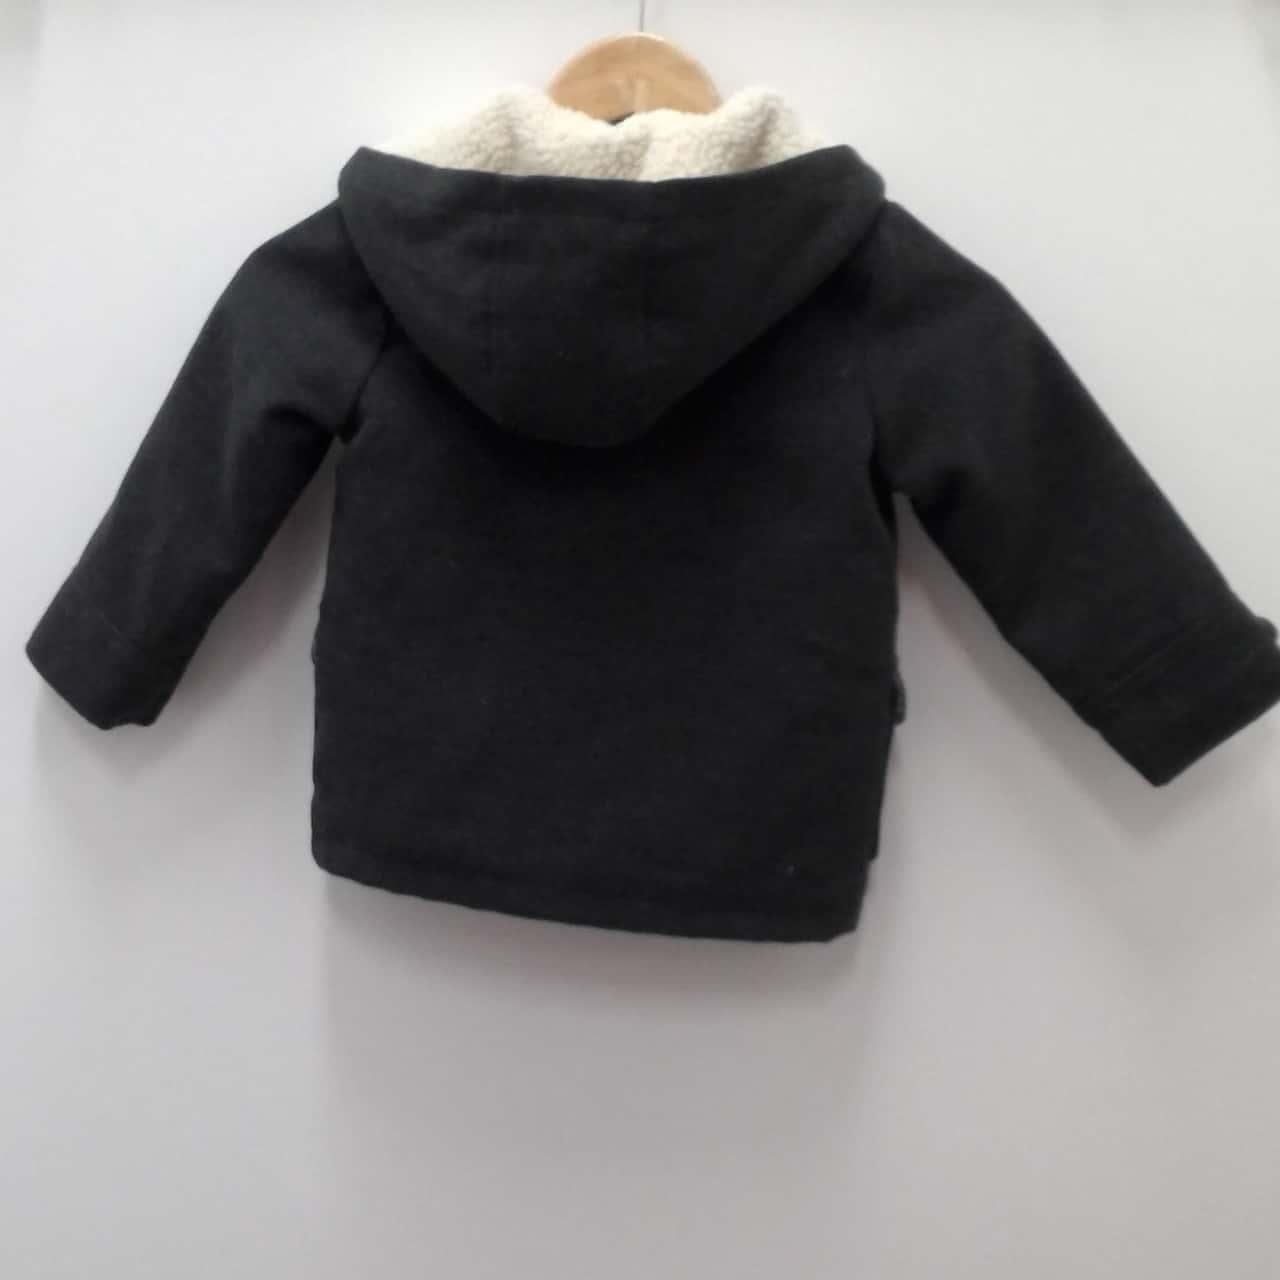 Kids Unisex LUCIE &MARC VINTAGE STYLE HOODED DUFFLE COAT Size 4 Jackets Cream/Grey